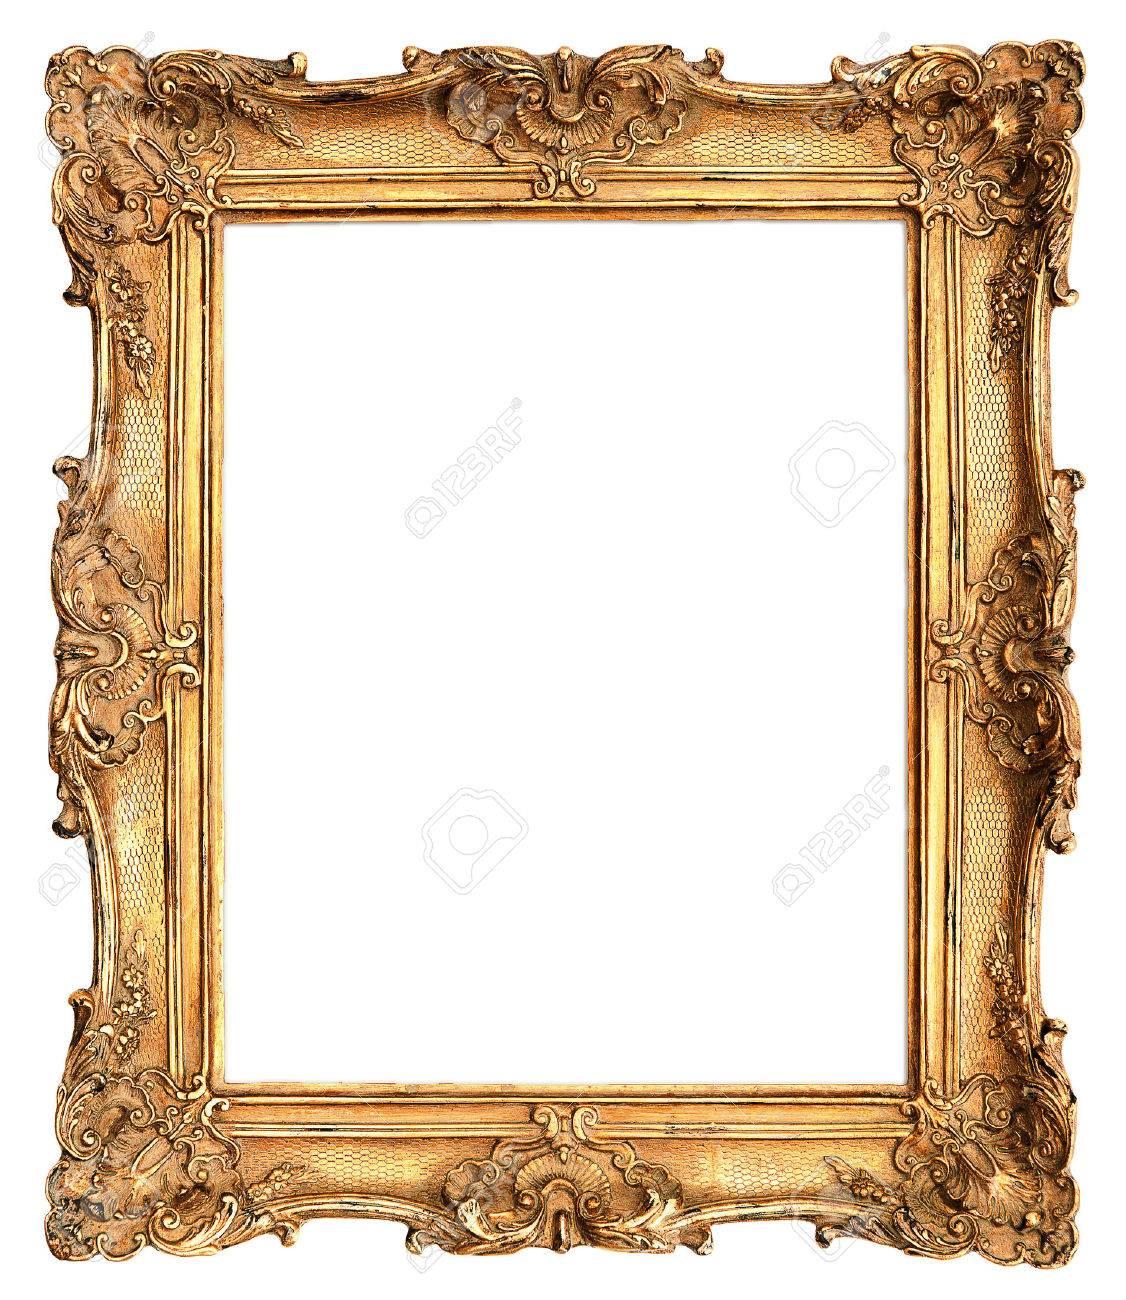 Antique Golden Frame Isolated On White Background Stock Photo ...